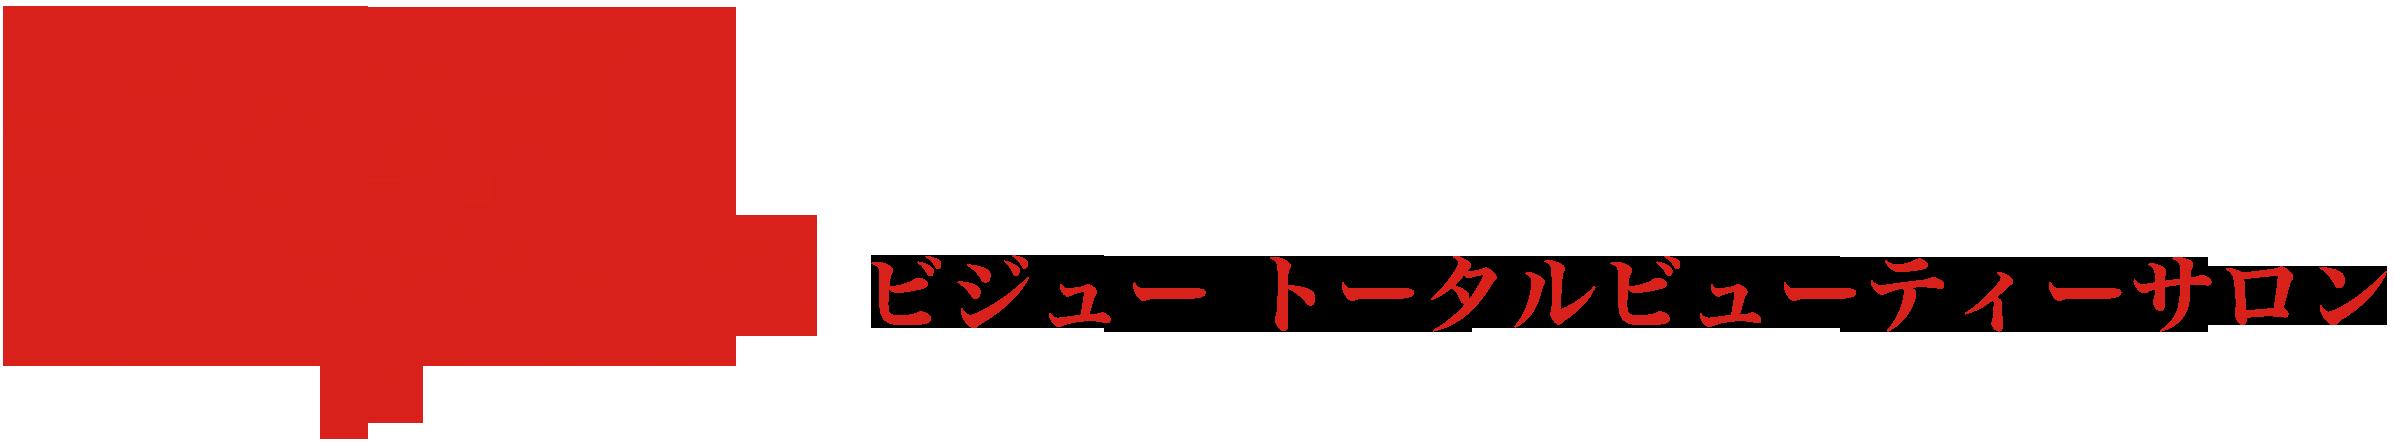 Bijou/ビジューサロン